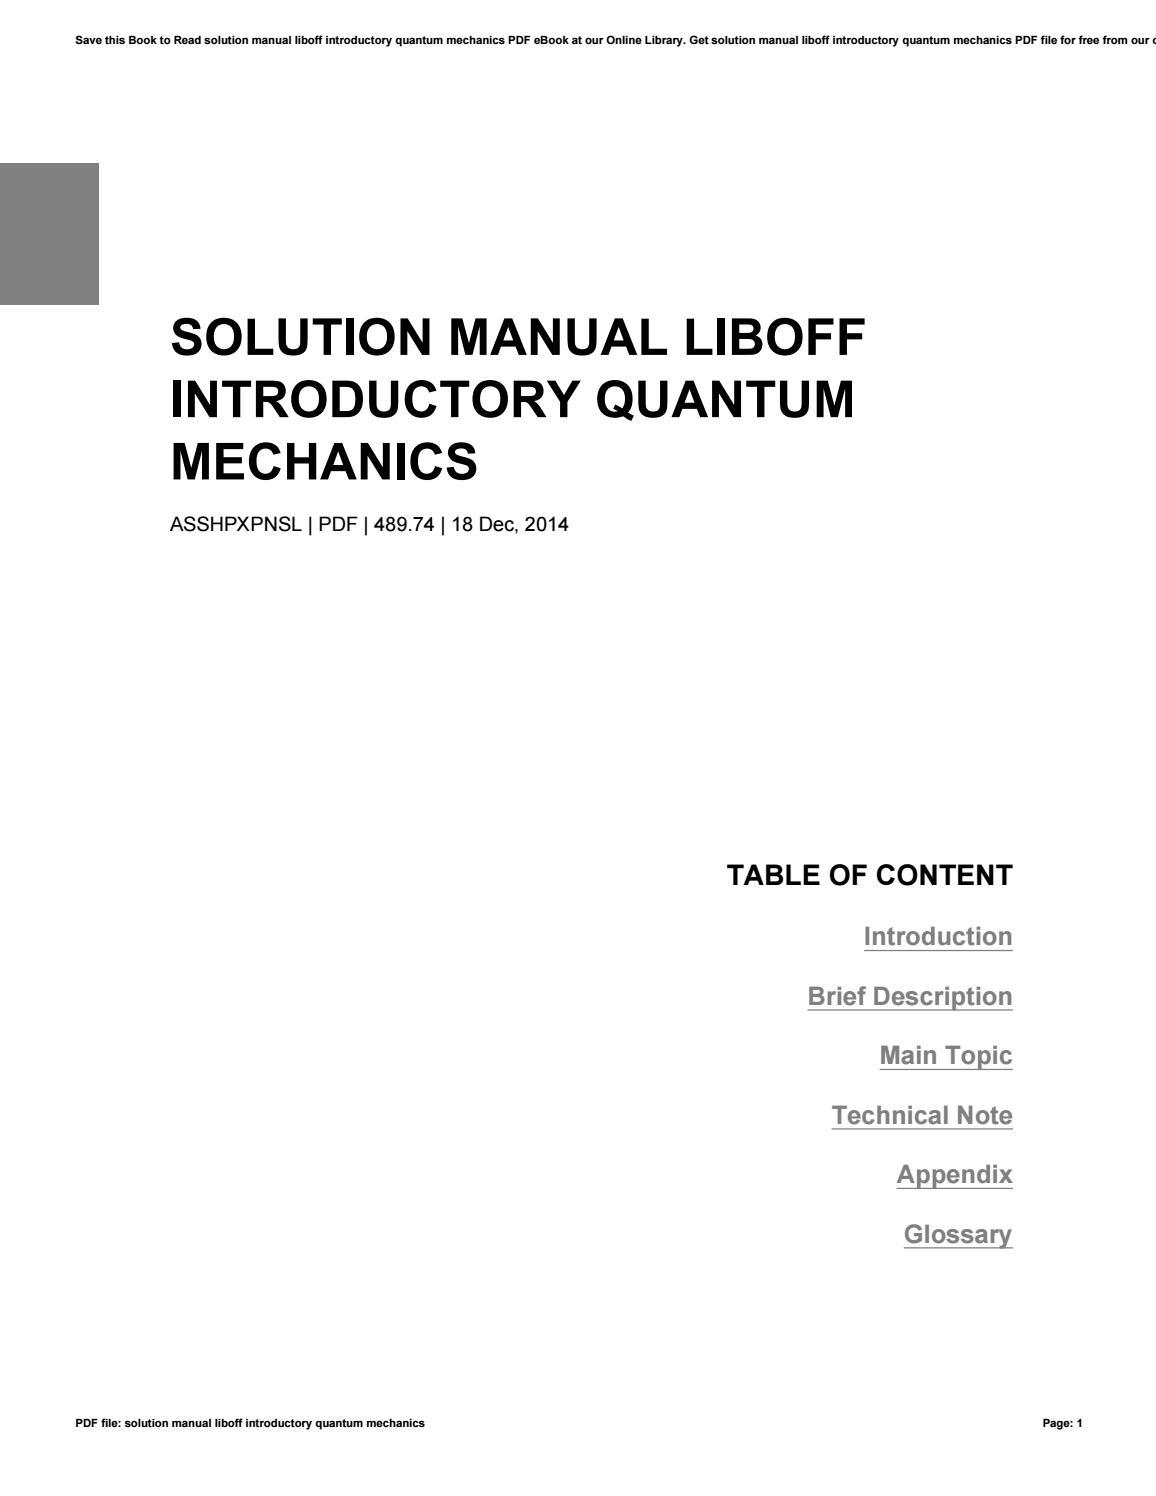 Solution manual liboff introductory quantum mechanics by mail4-us297 - issuu